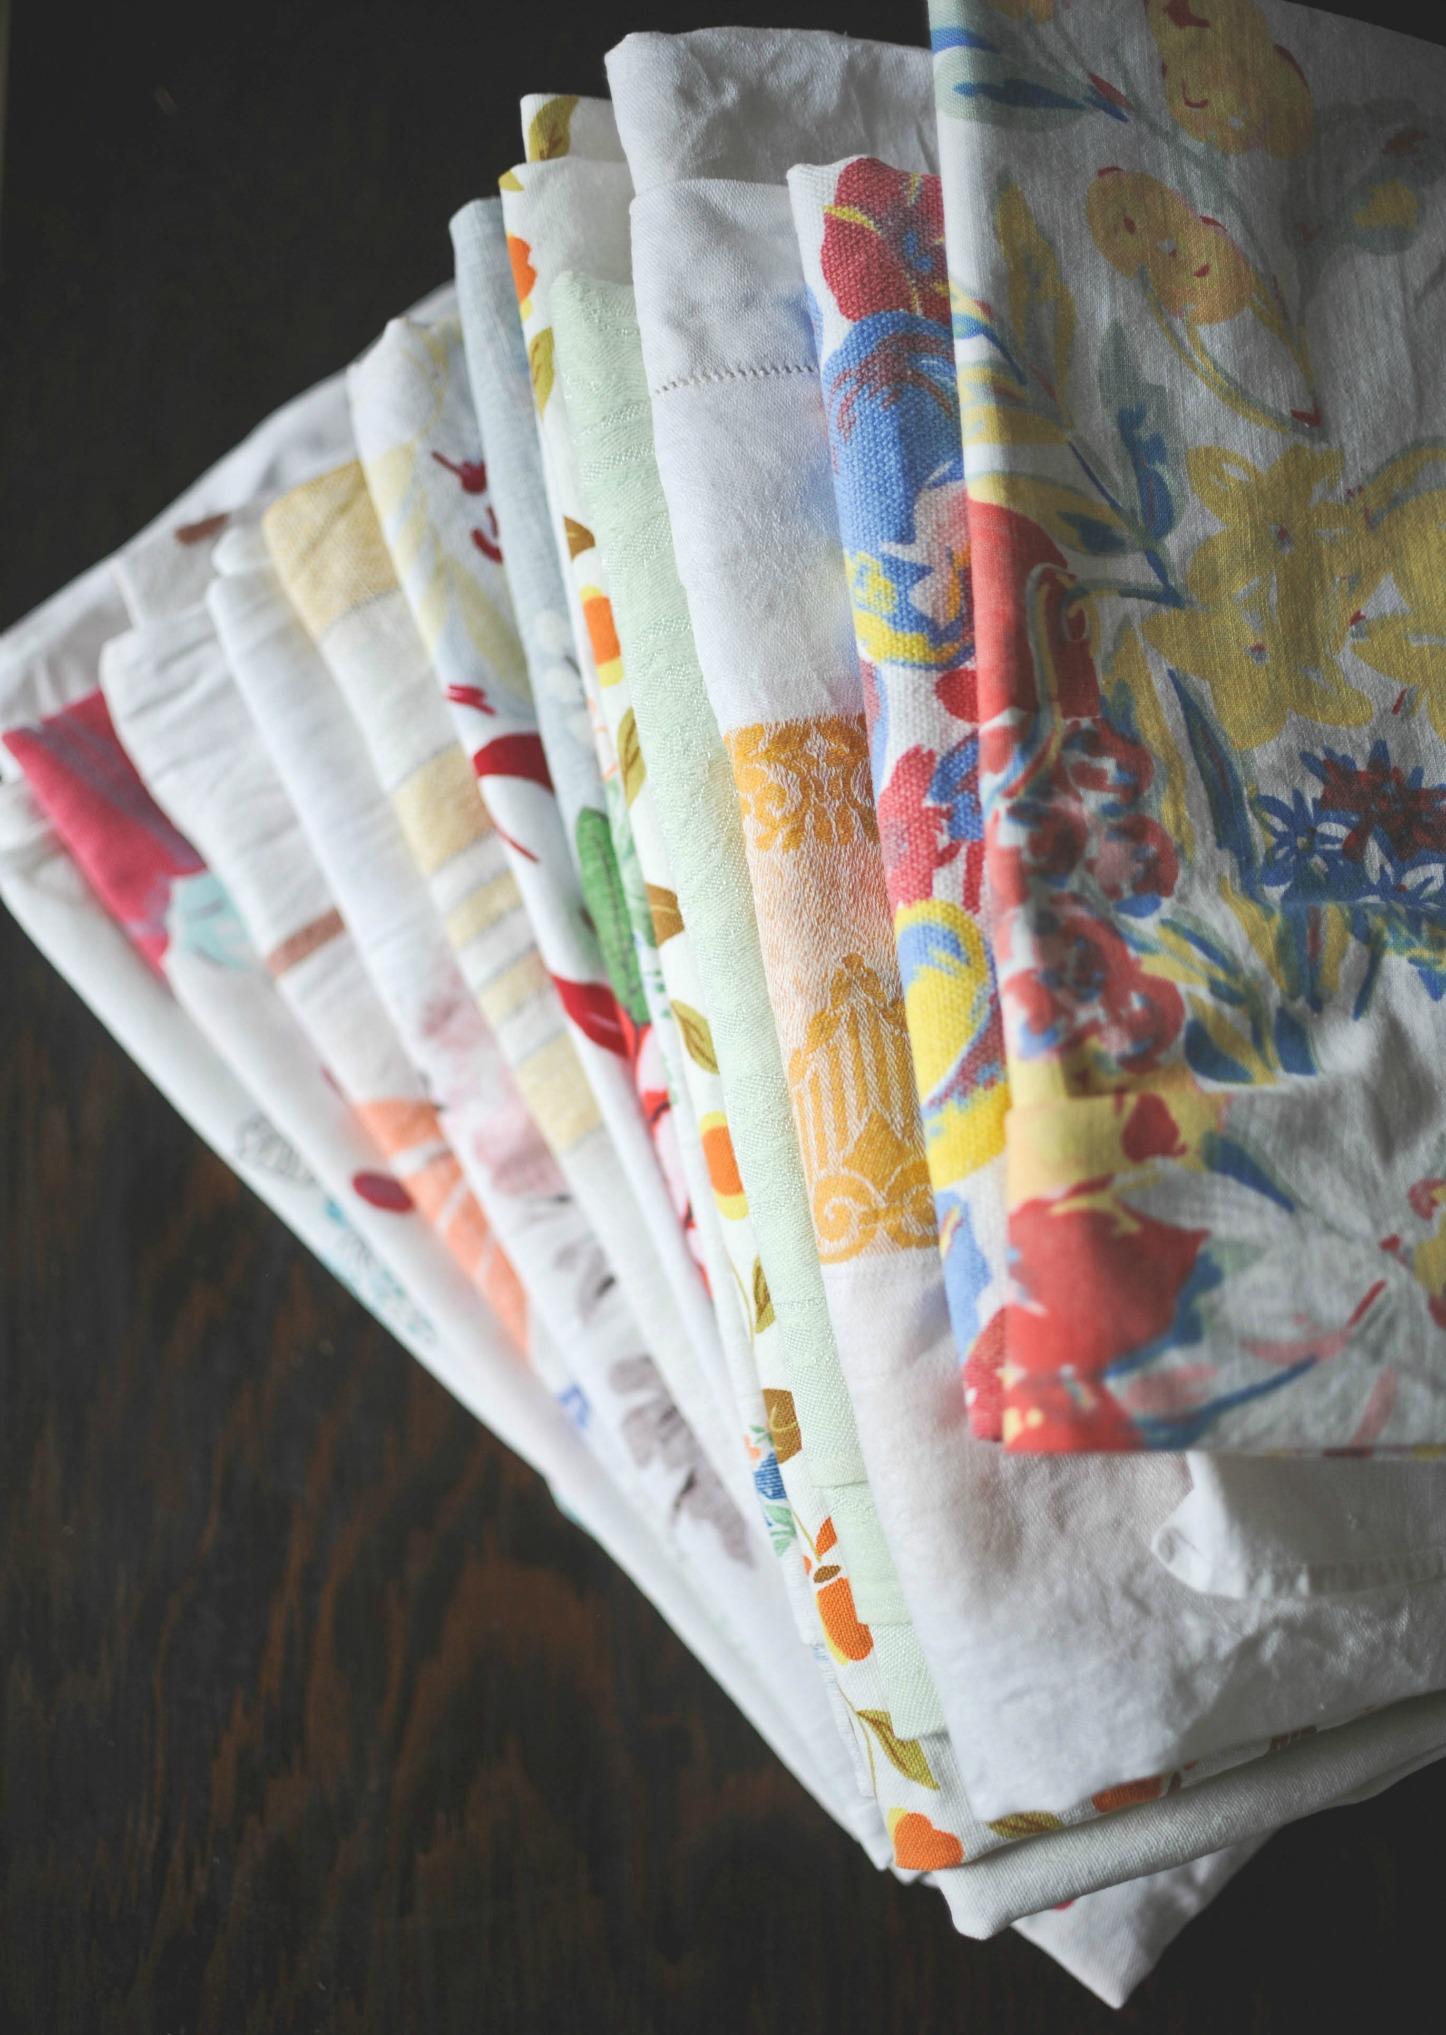 Retro Tablecloth - $8